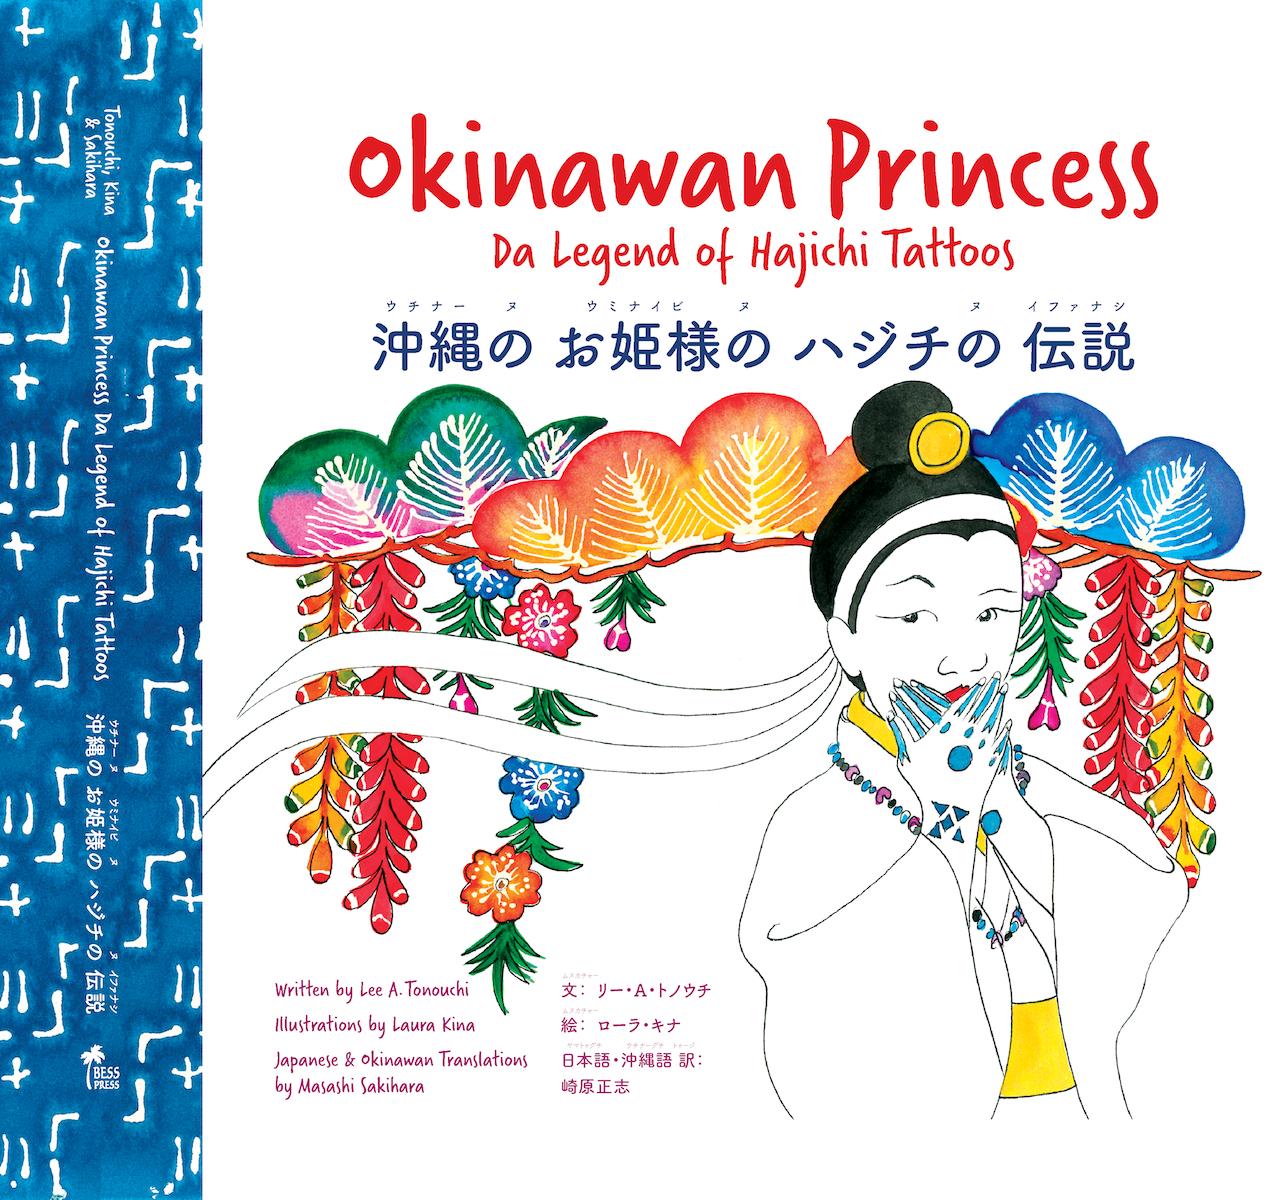 Okinawan Princess cover.jpg